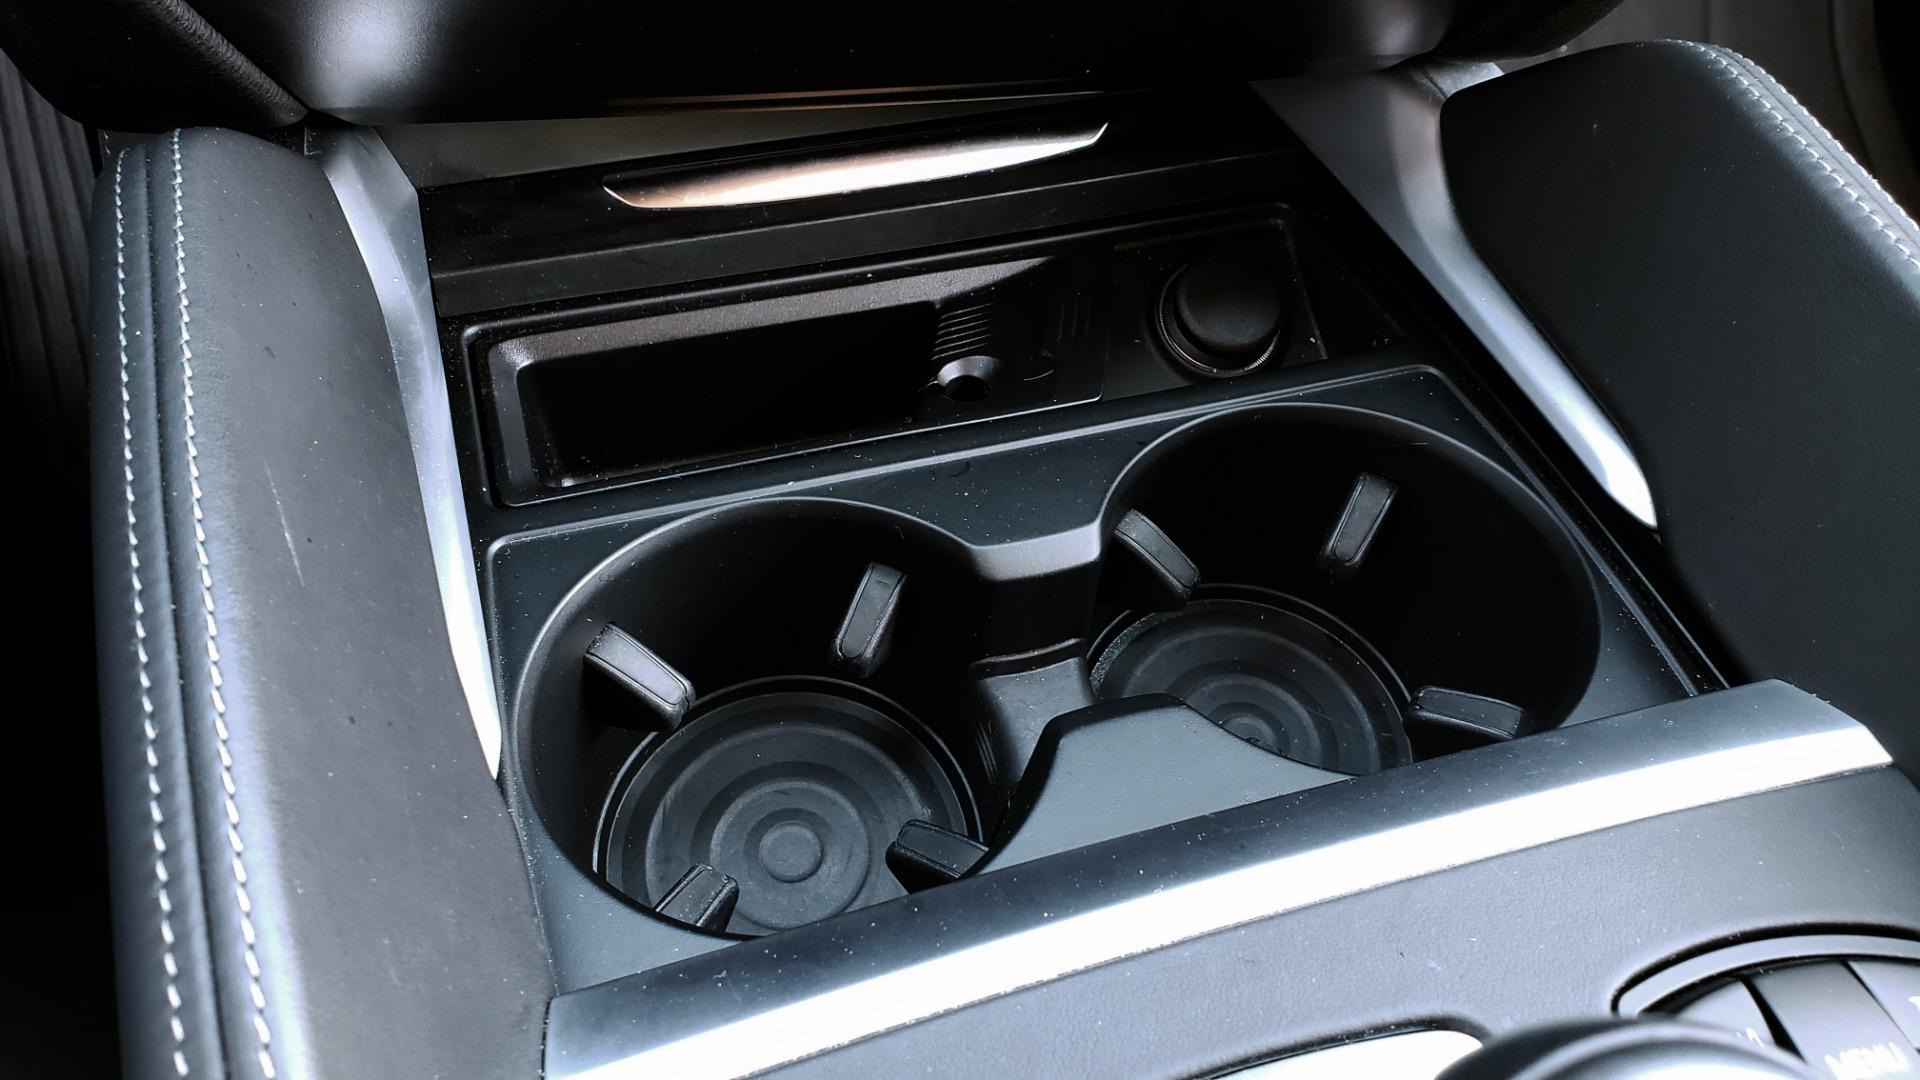 Used 2016 BMW X6 M EXEC PKG / DRVR ASST / NAV / SUNROOF / BLIND SPOT / REARVIEW for sale Sold at Formula Imports in Charlotte NC 28227 58